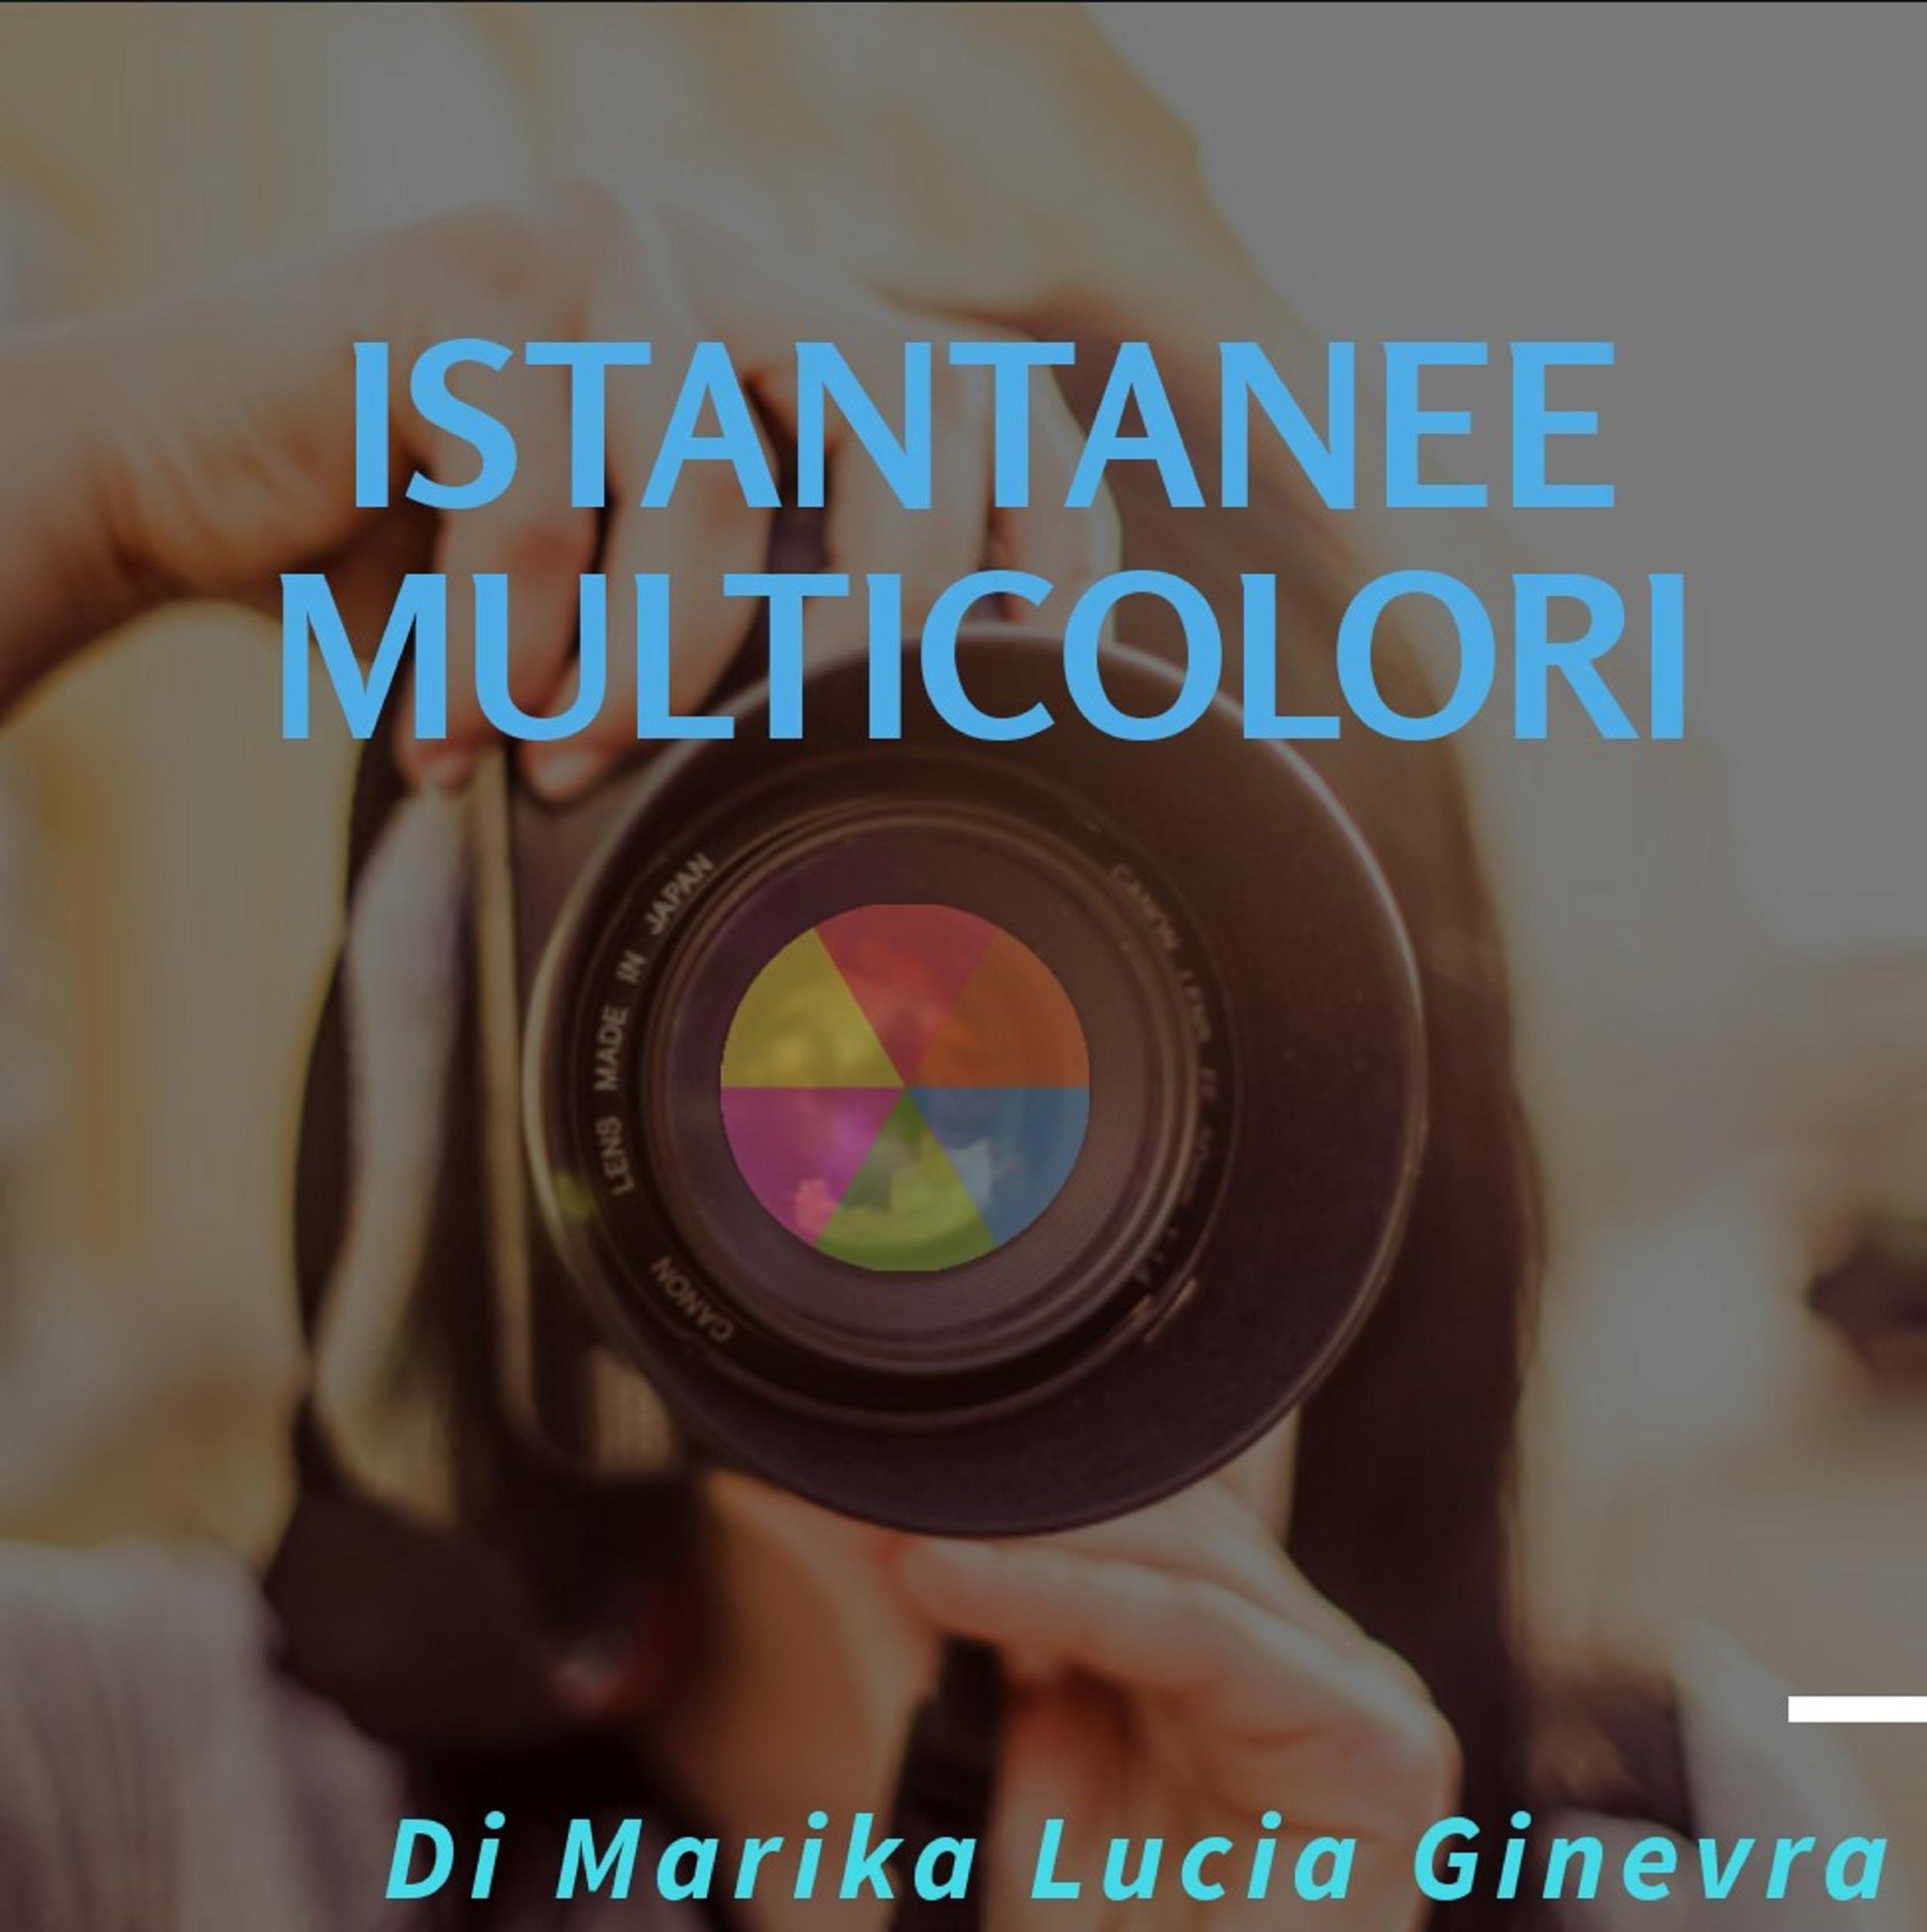 Istantanee Multicolori